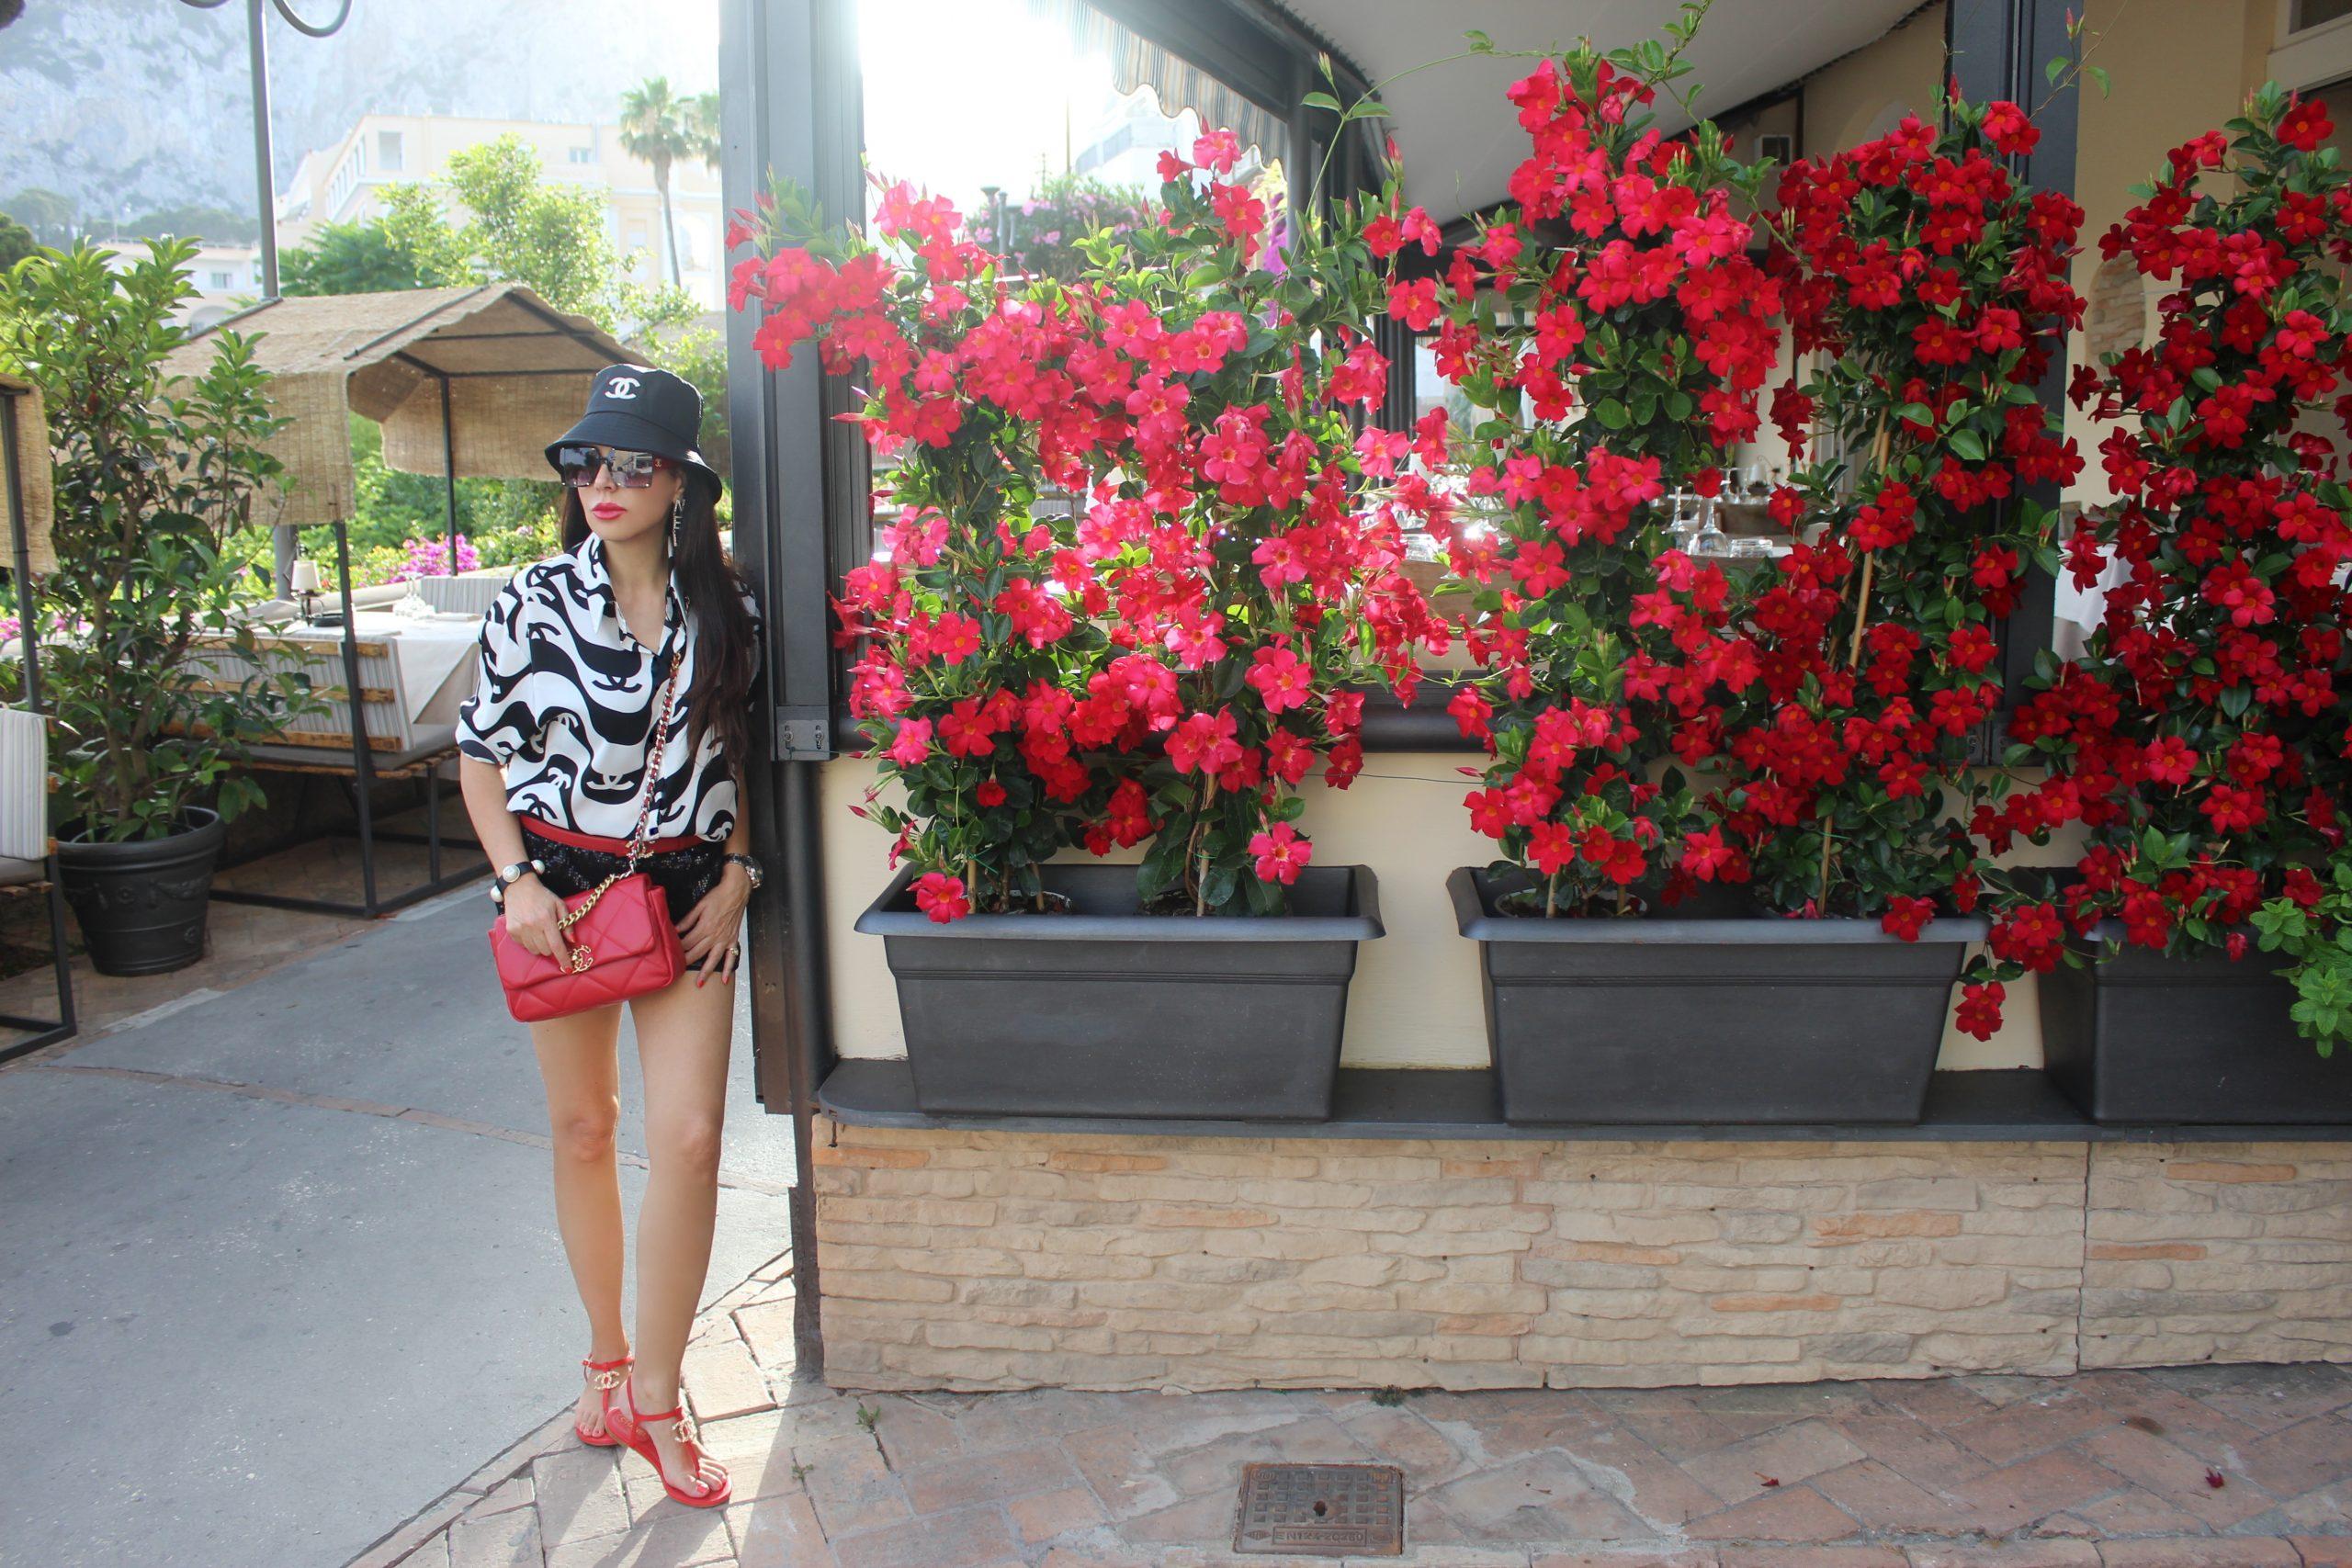 Capri Luxury Boutique Hotel Chanel Italian Style Staycation Chanel Total Look Paola Lauretano